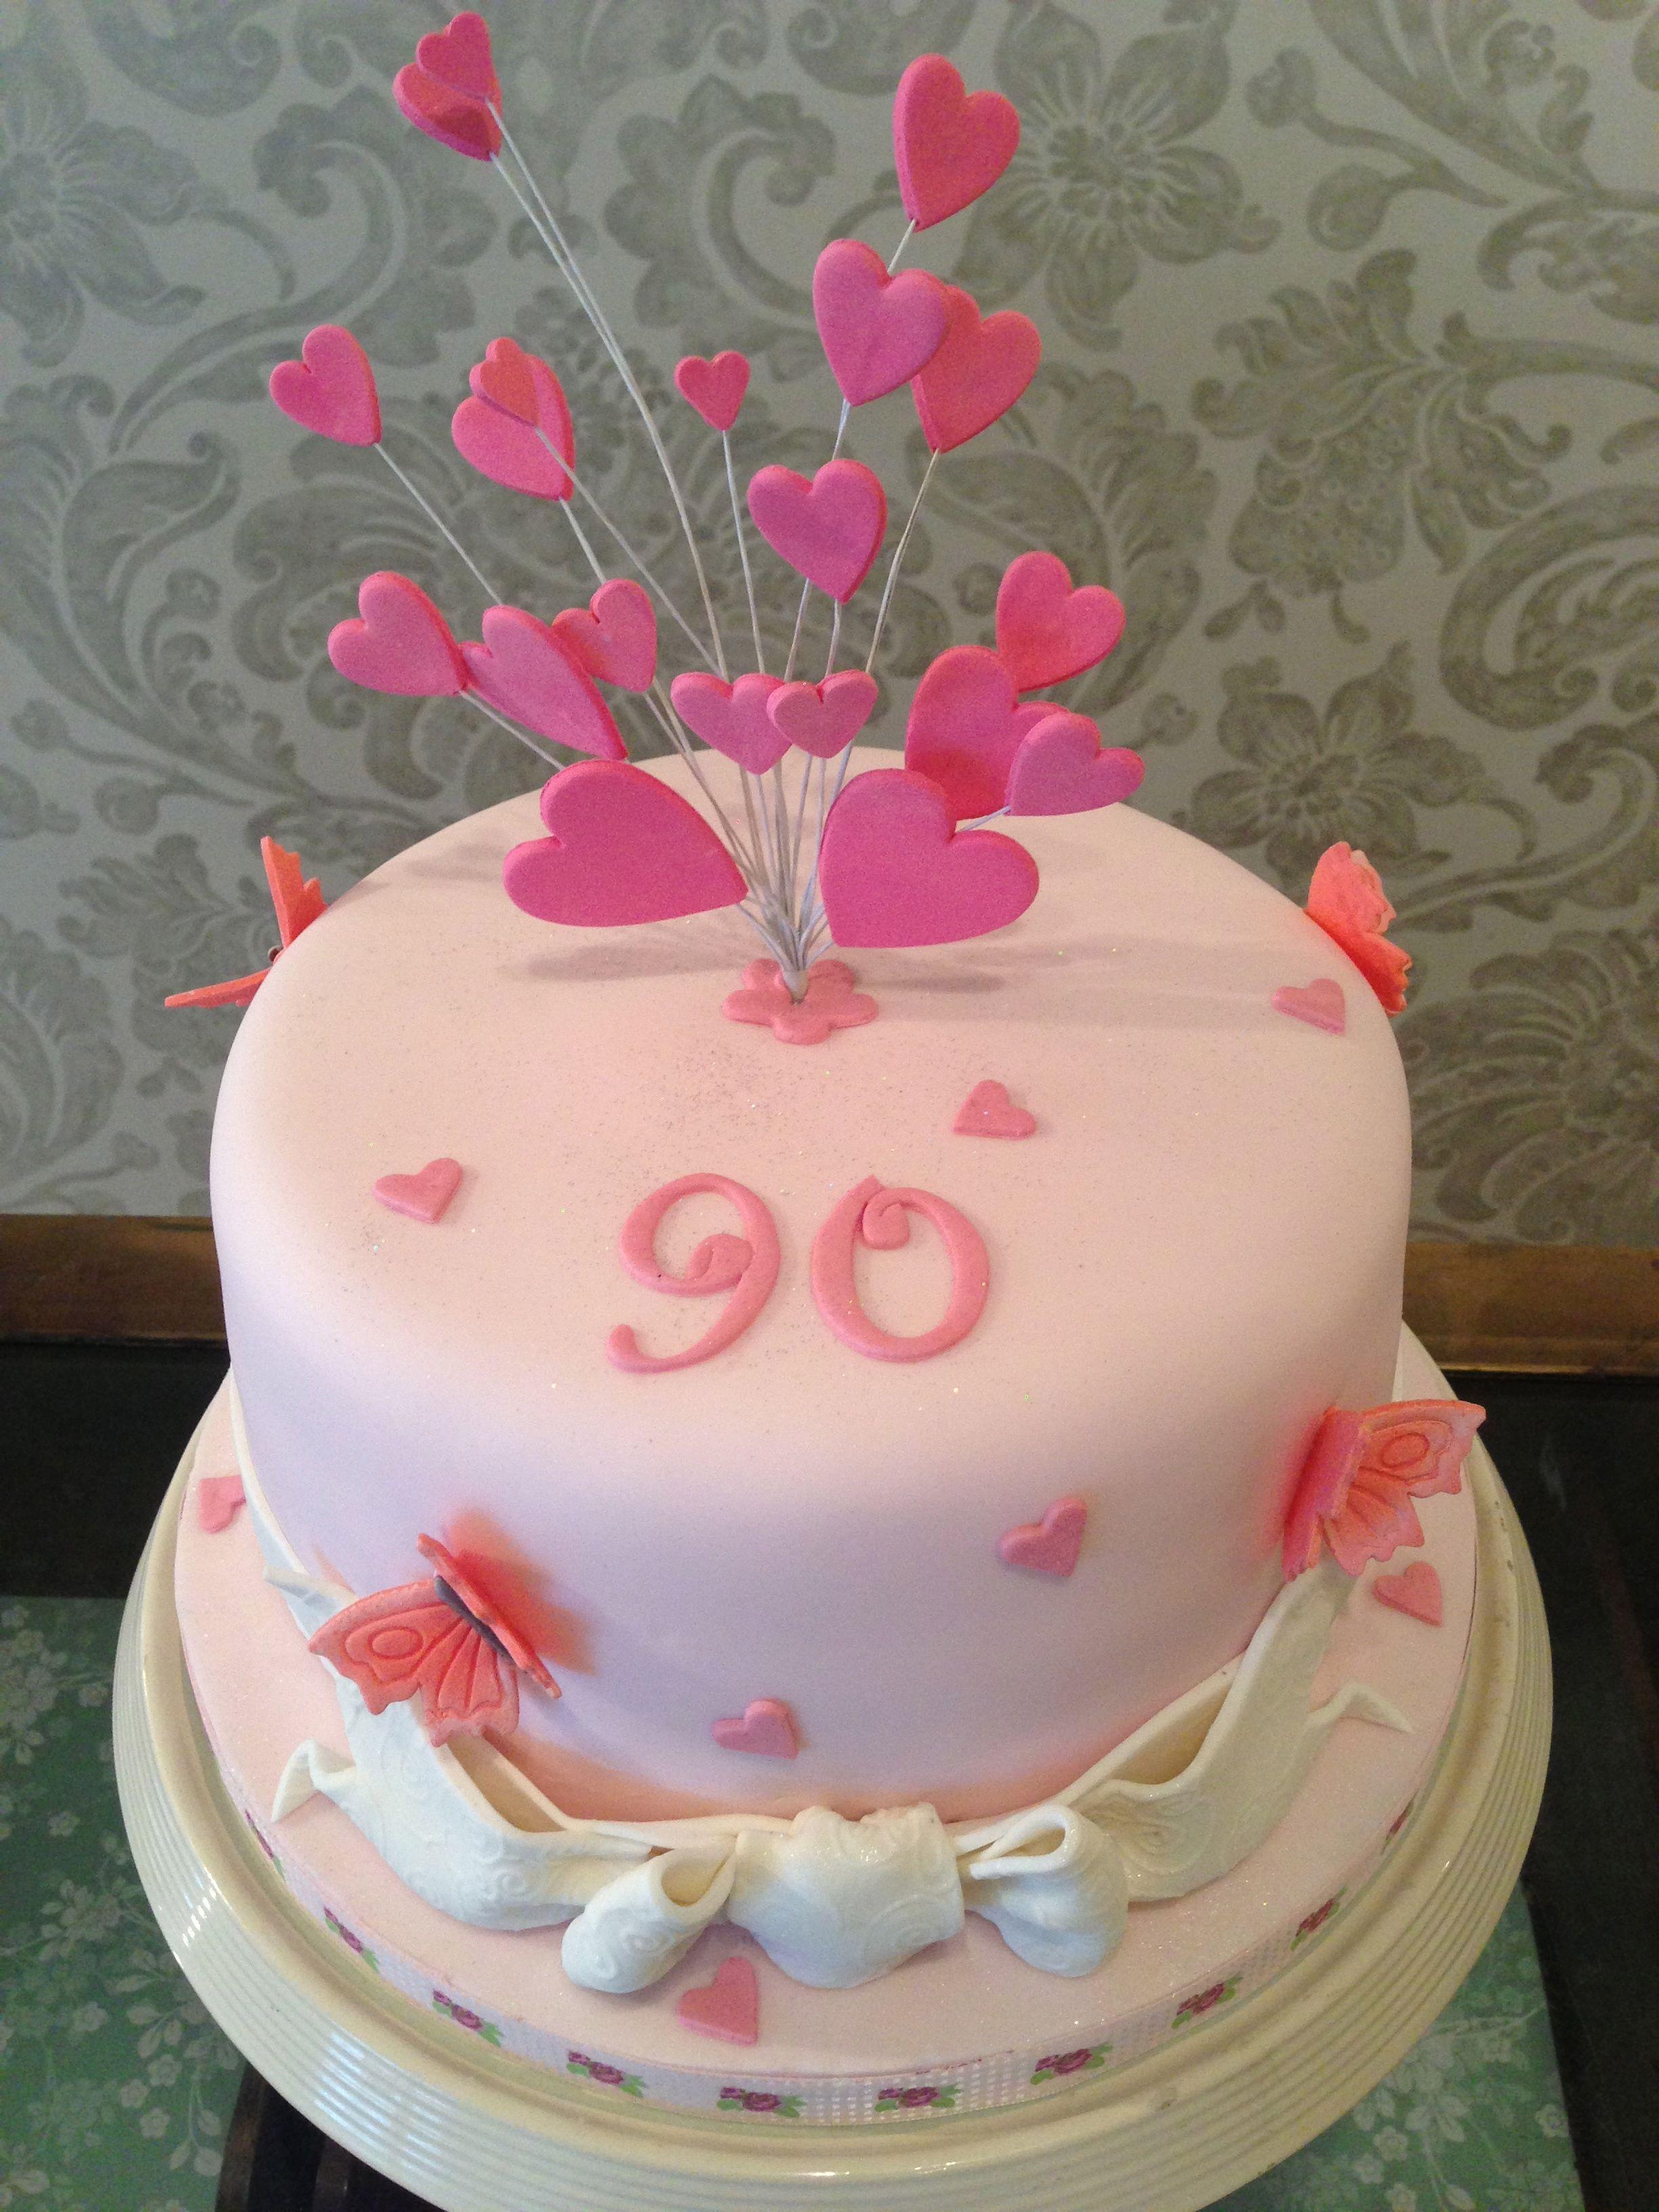 90th birthday cake designs